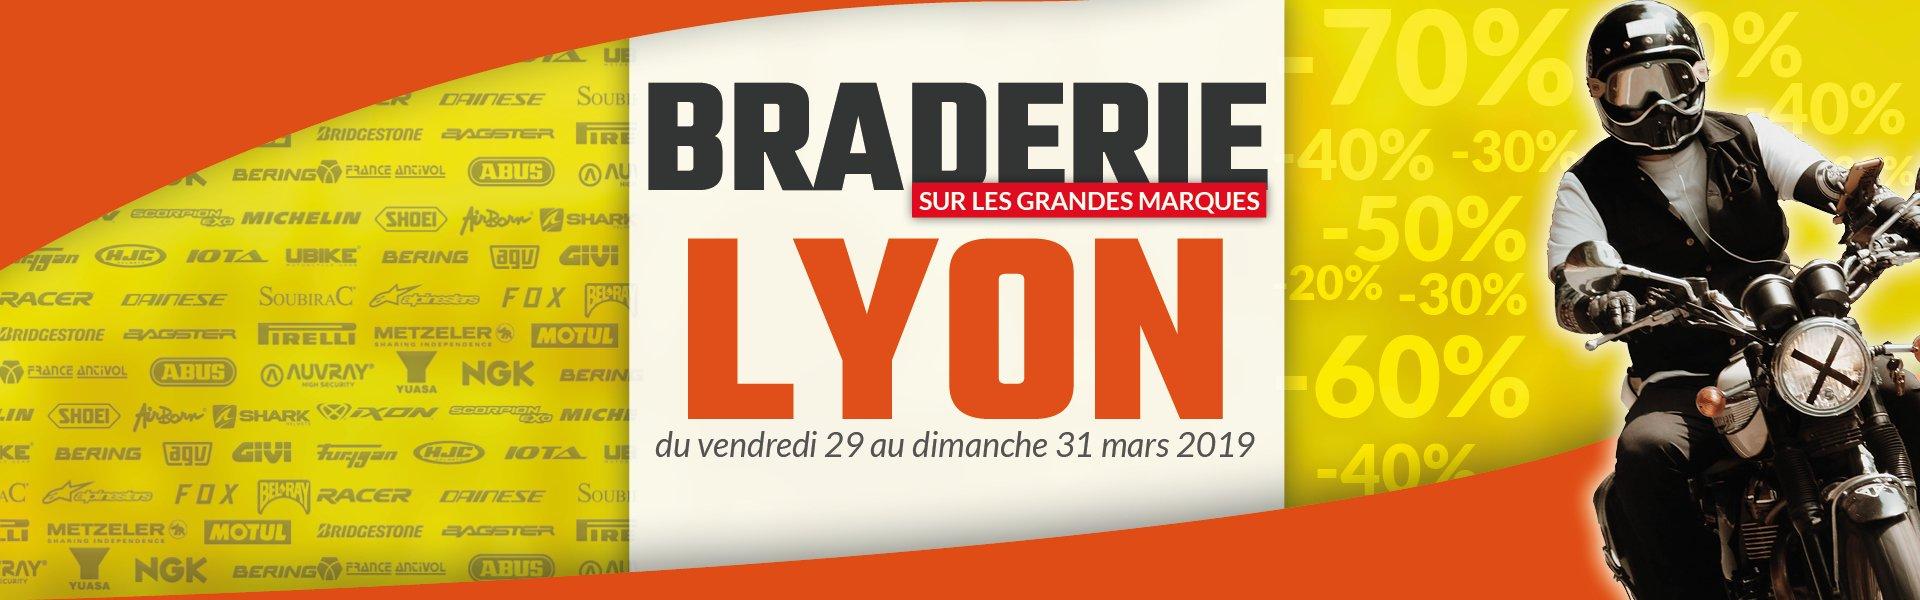 BRADERIE CARDY Lyon